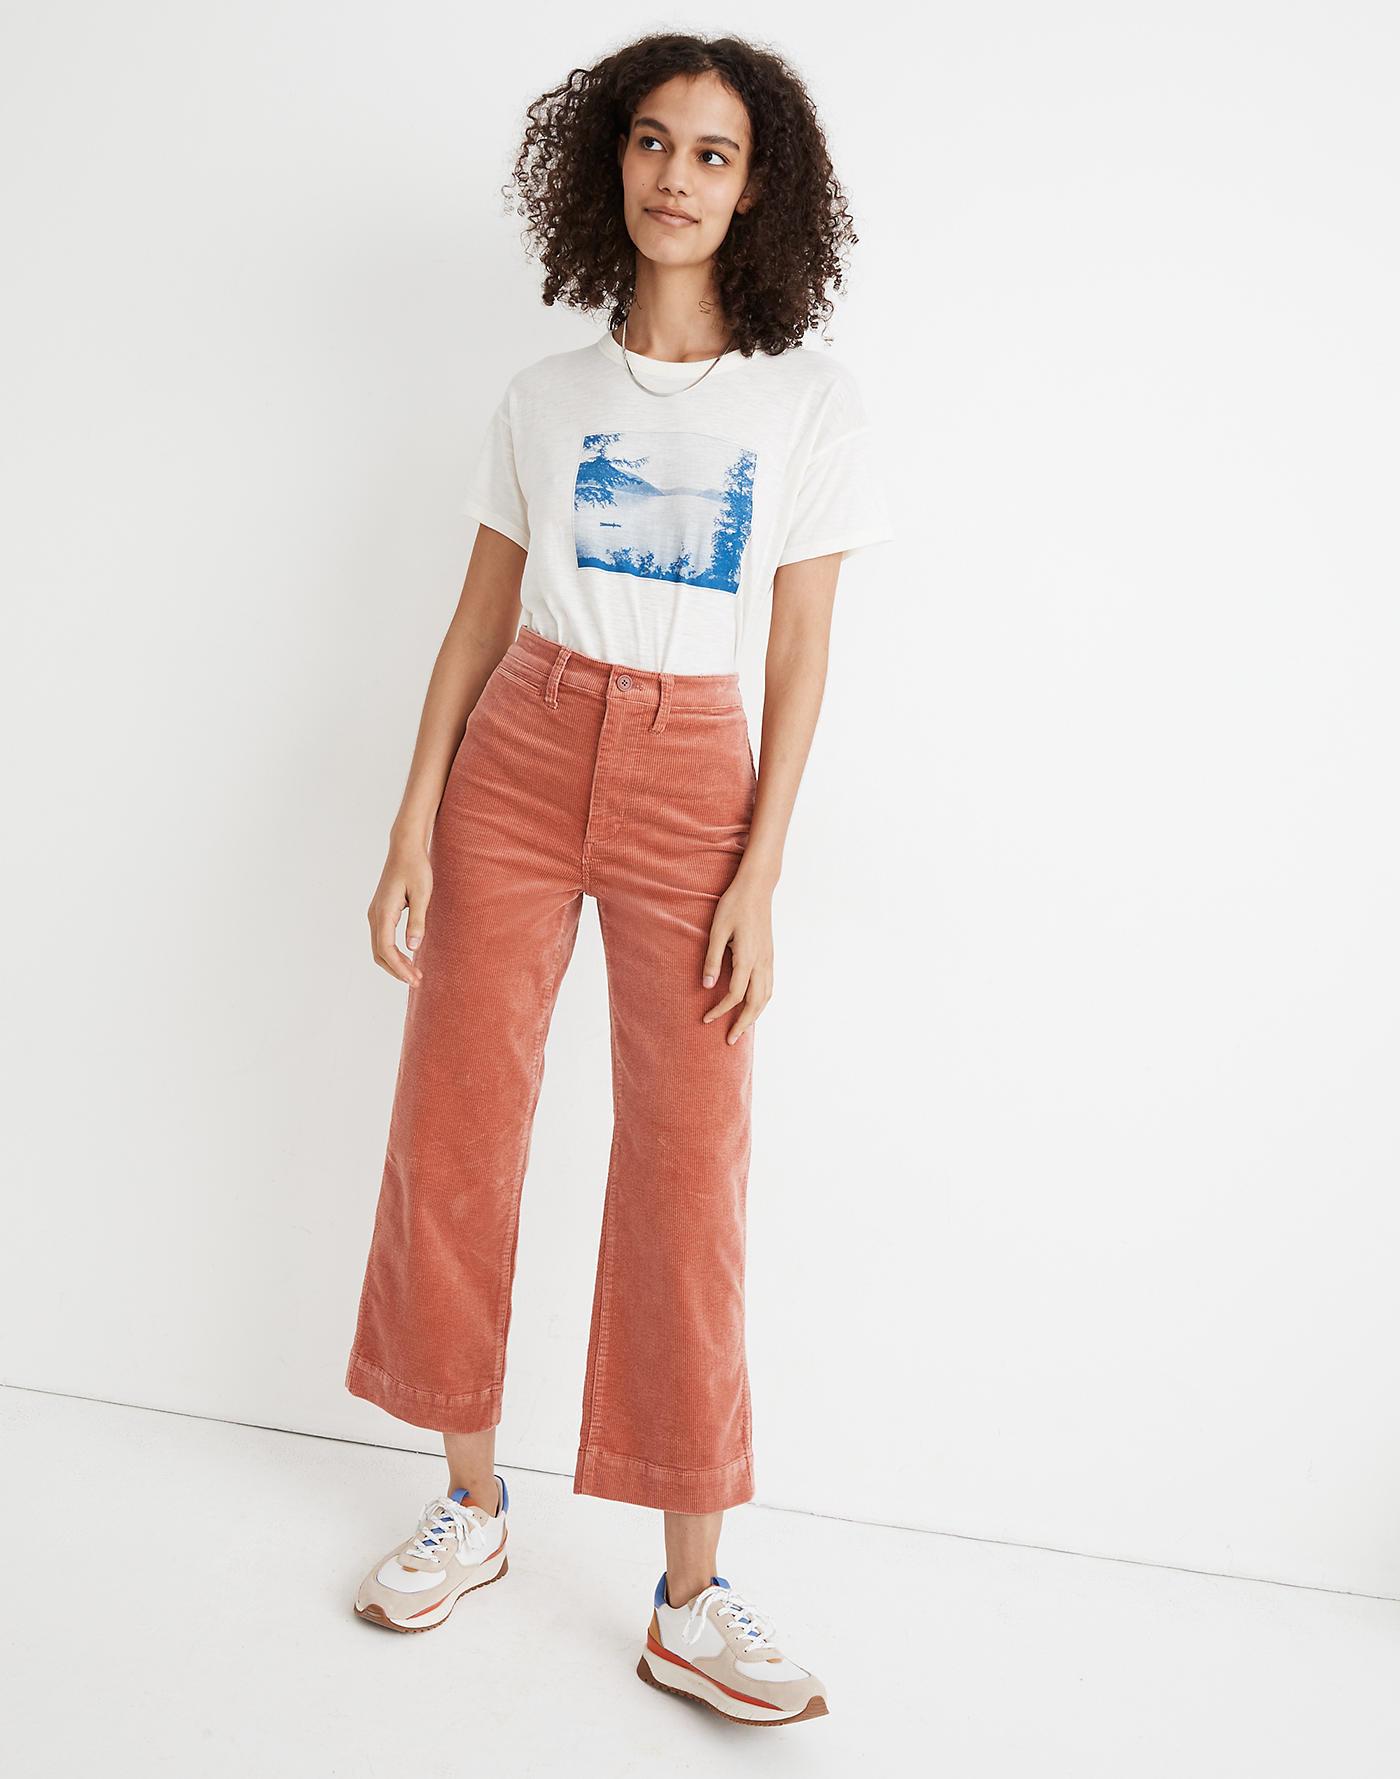 Model wearing pink pants